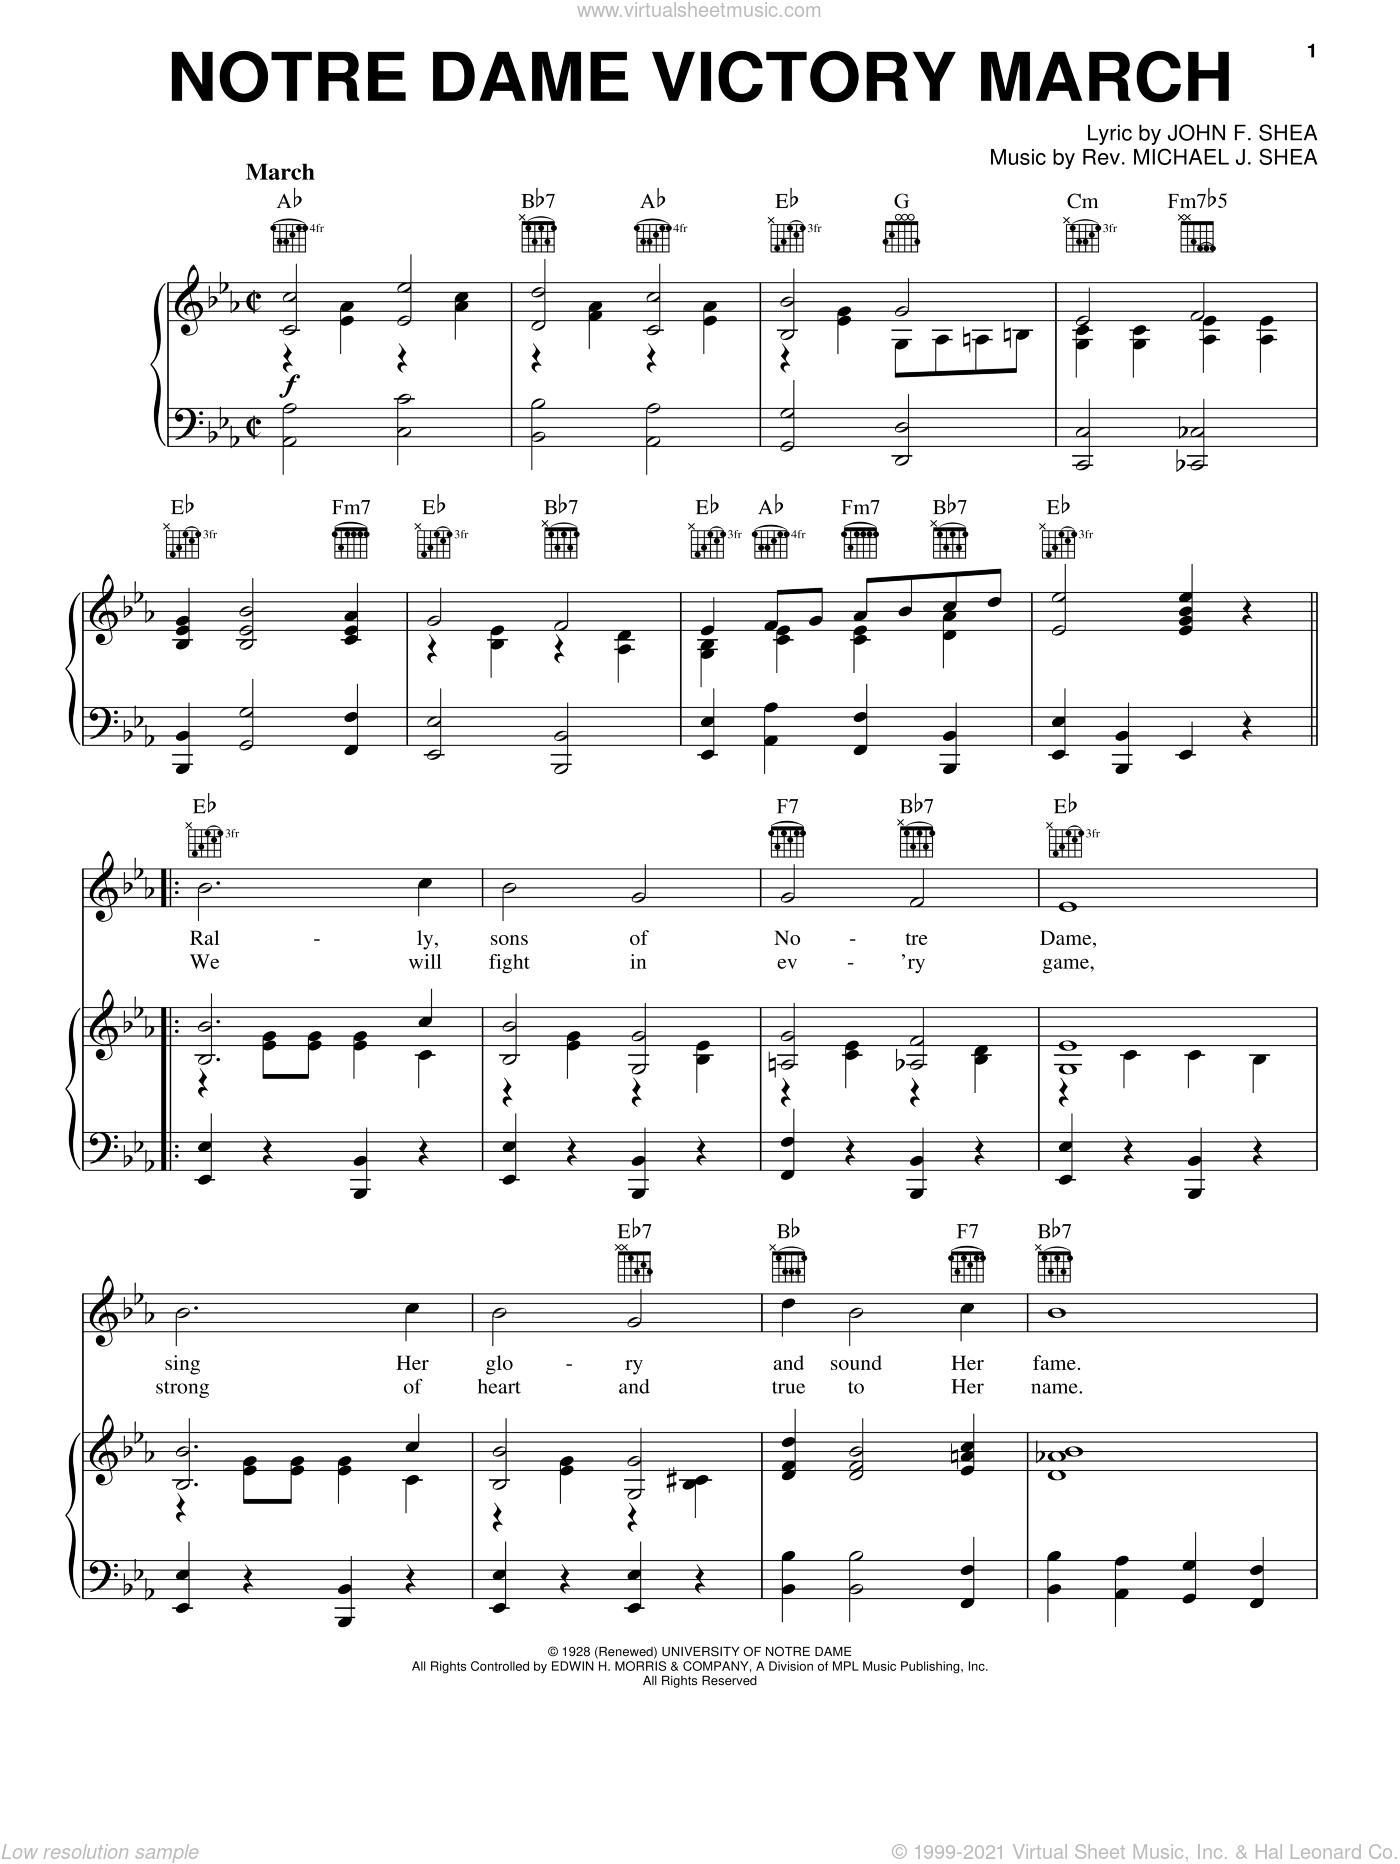 Notre Dame Victory March sheet music for voice, piano or guitar by Shea & Shea, John F. Shea and Rev. Michael J. Shea, intermediate skill level